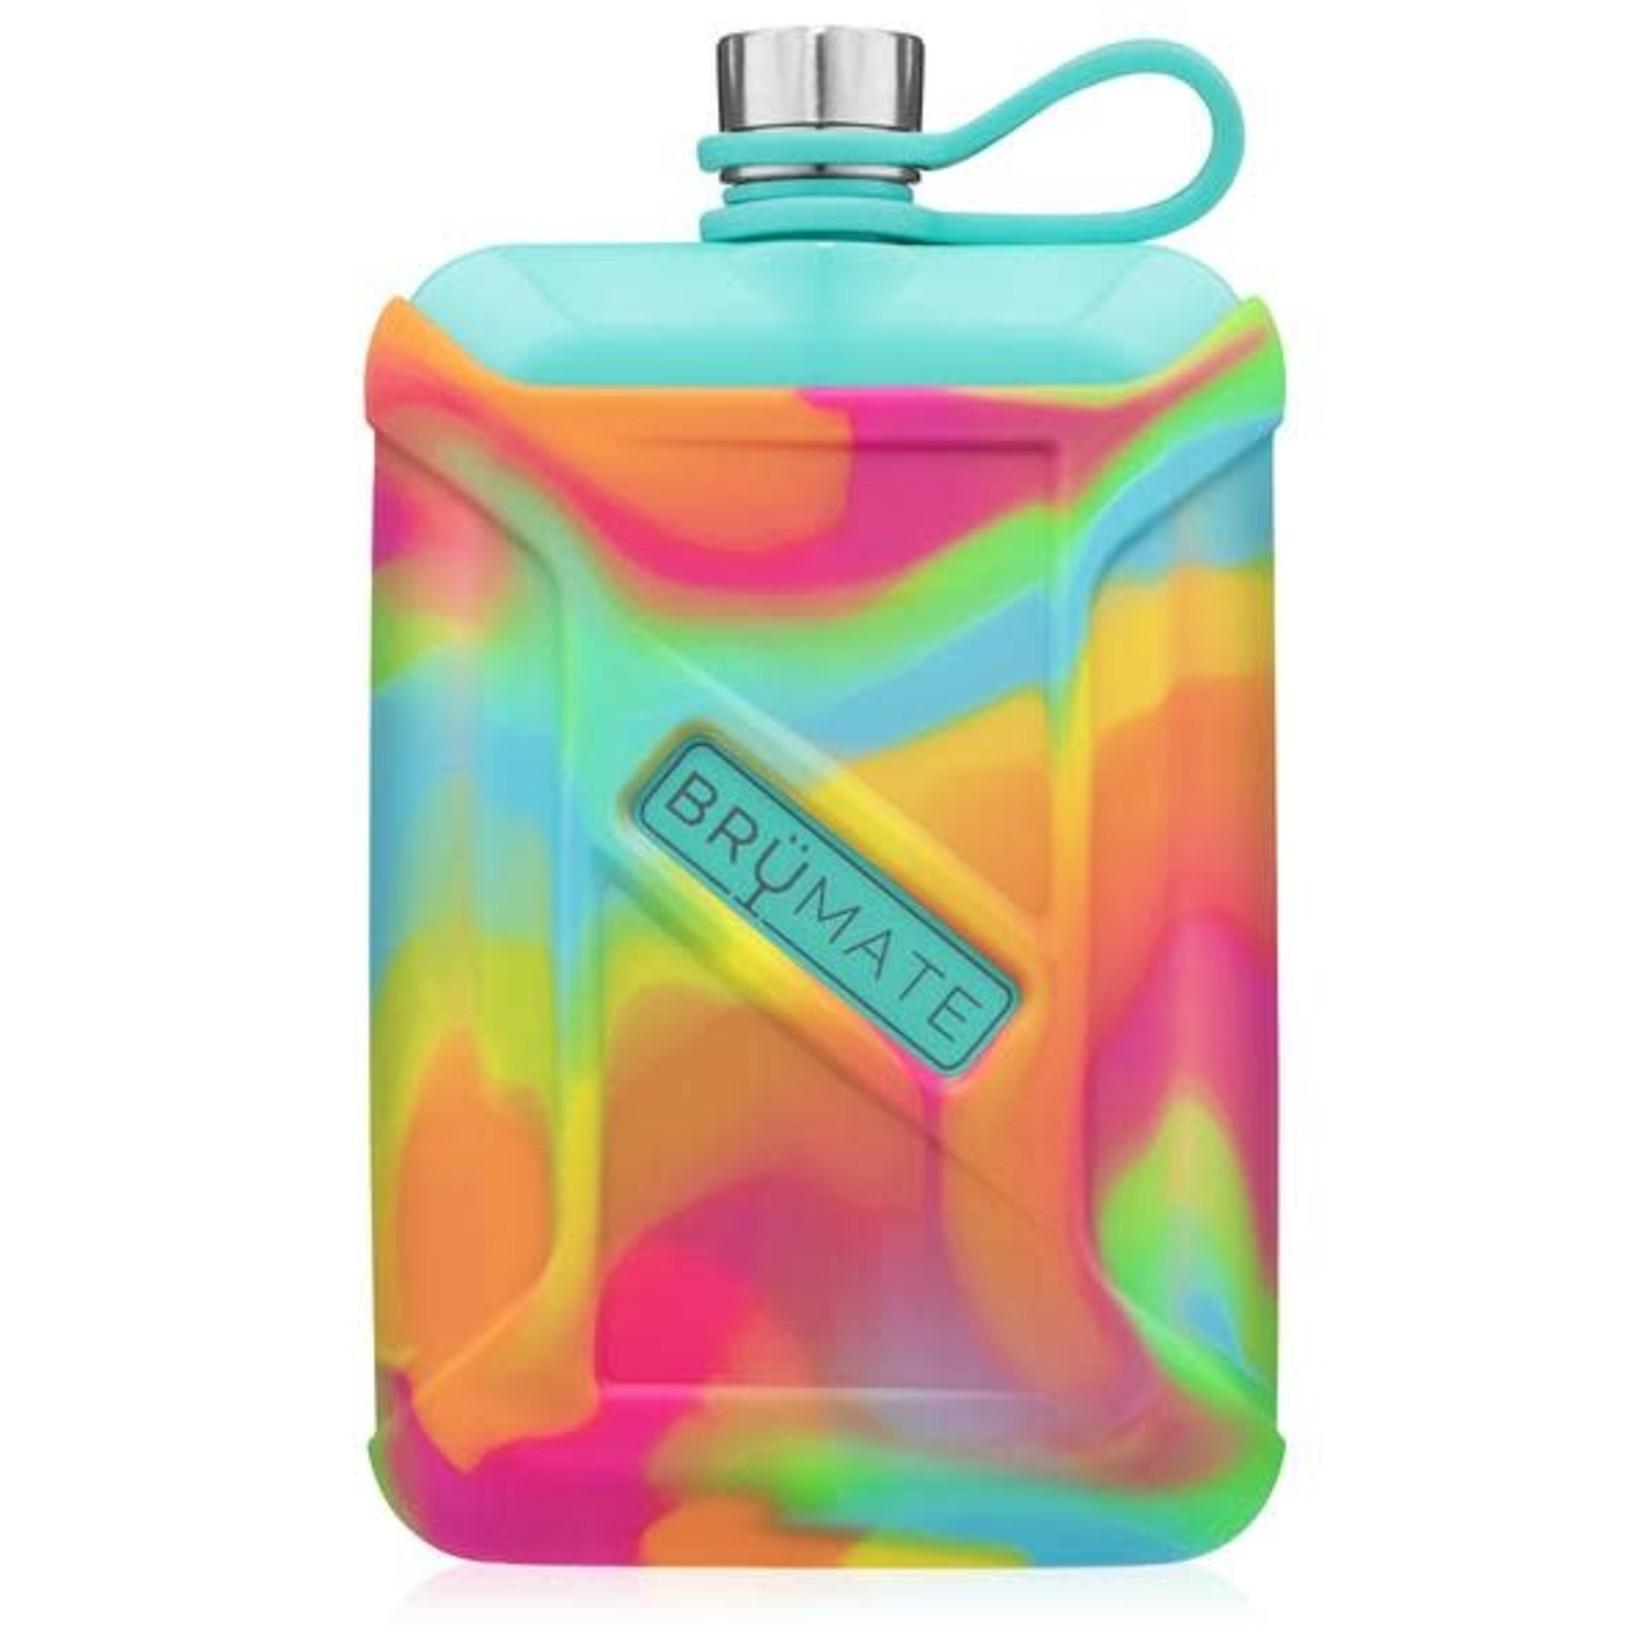 Brumate Liquor Canteen 8 oz Aqua With Rainbow Swirl